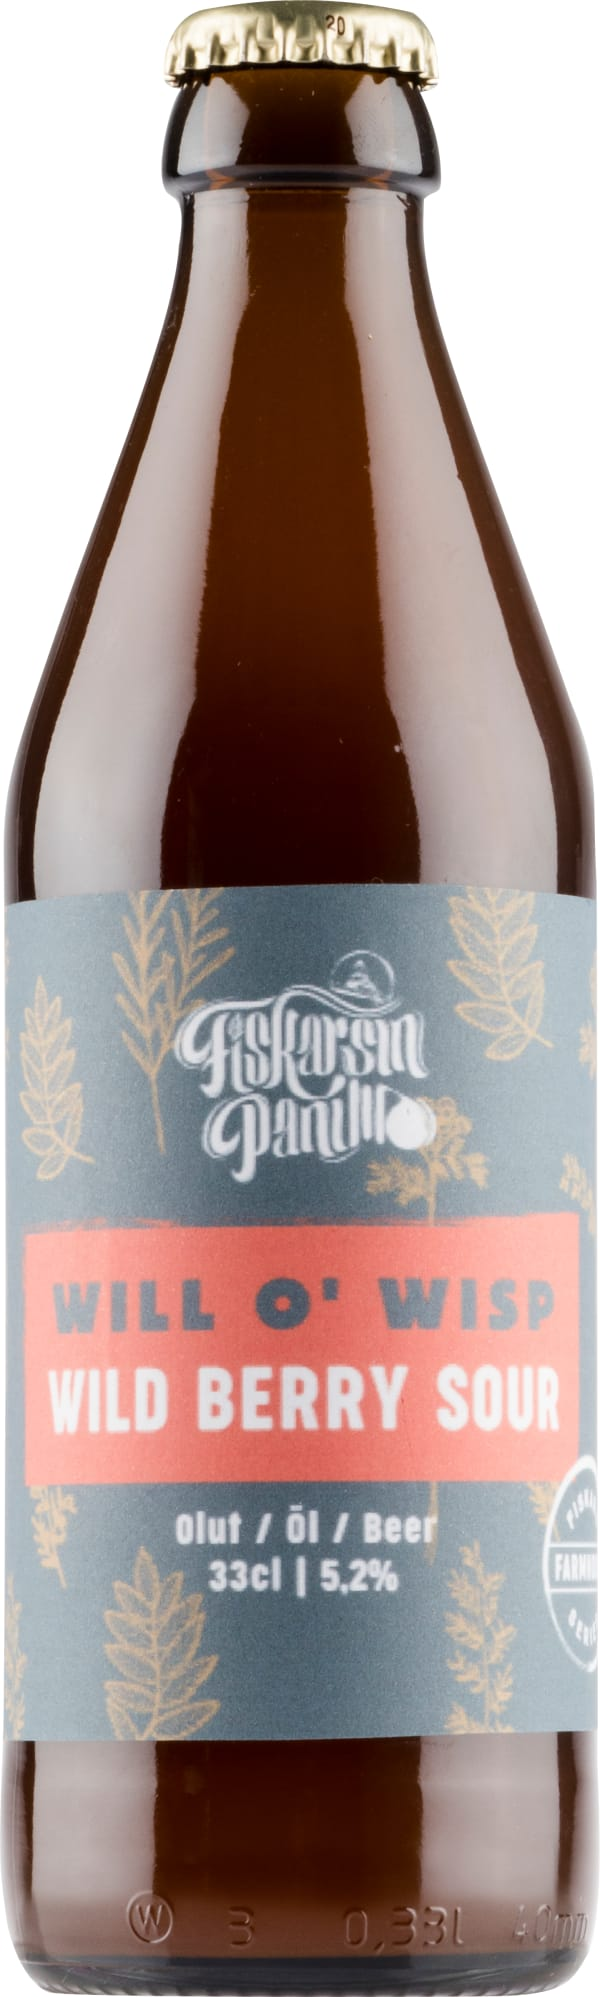 Fiskarsin Will O' Wisp Wild Berry Sour